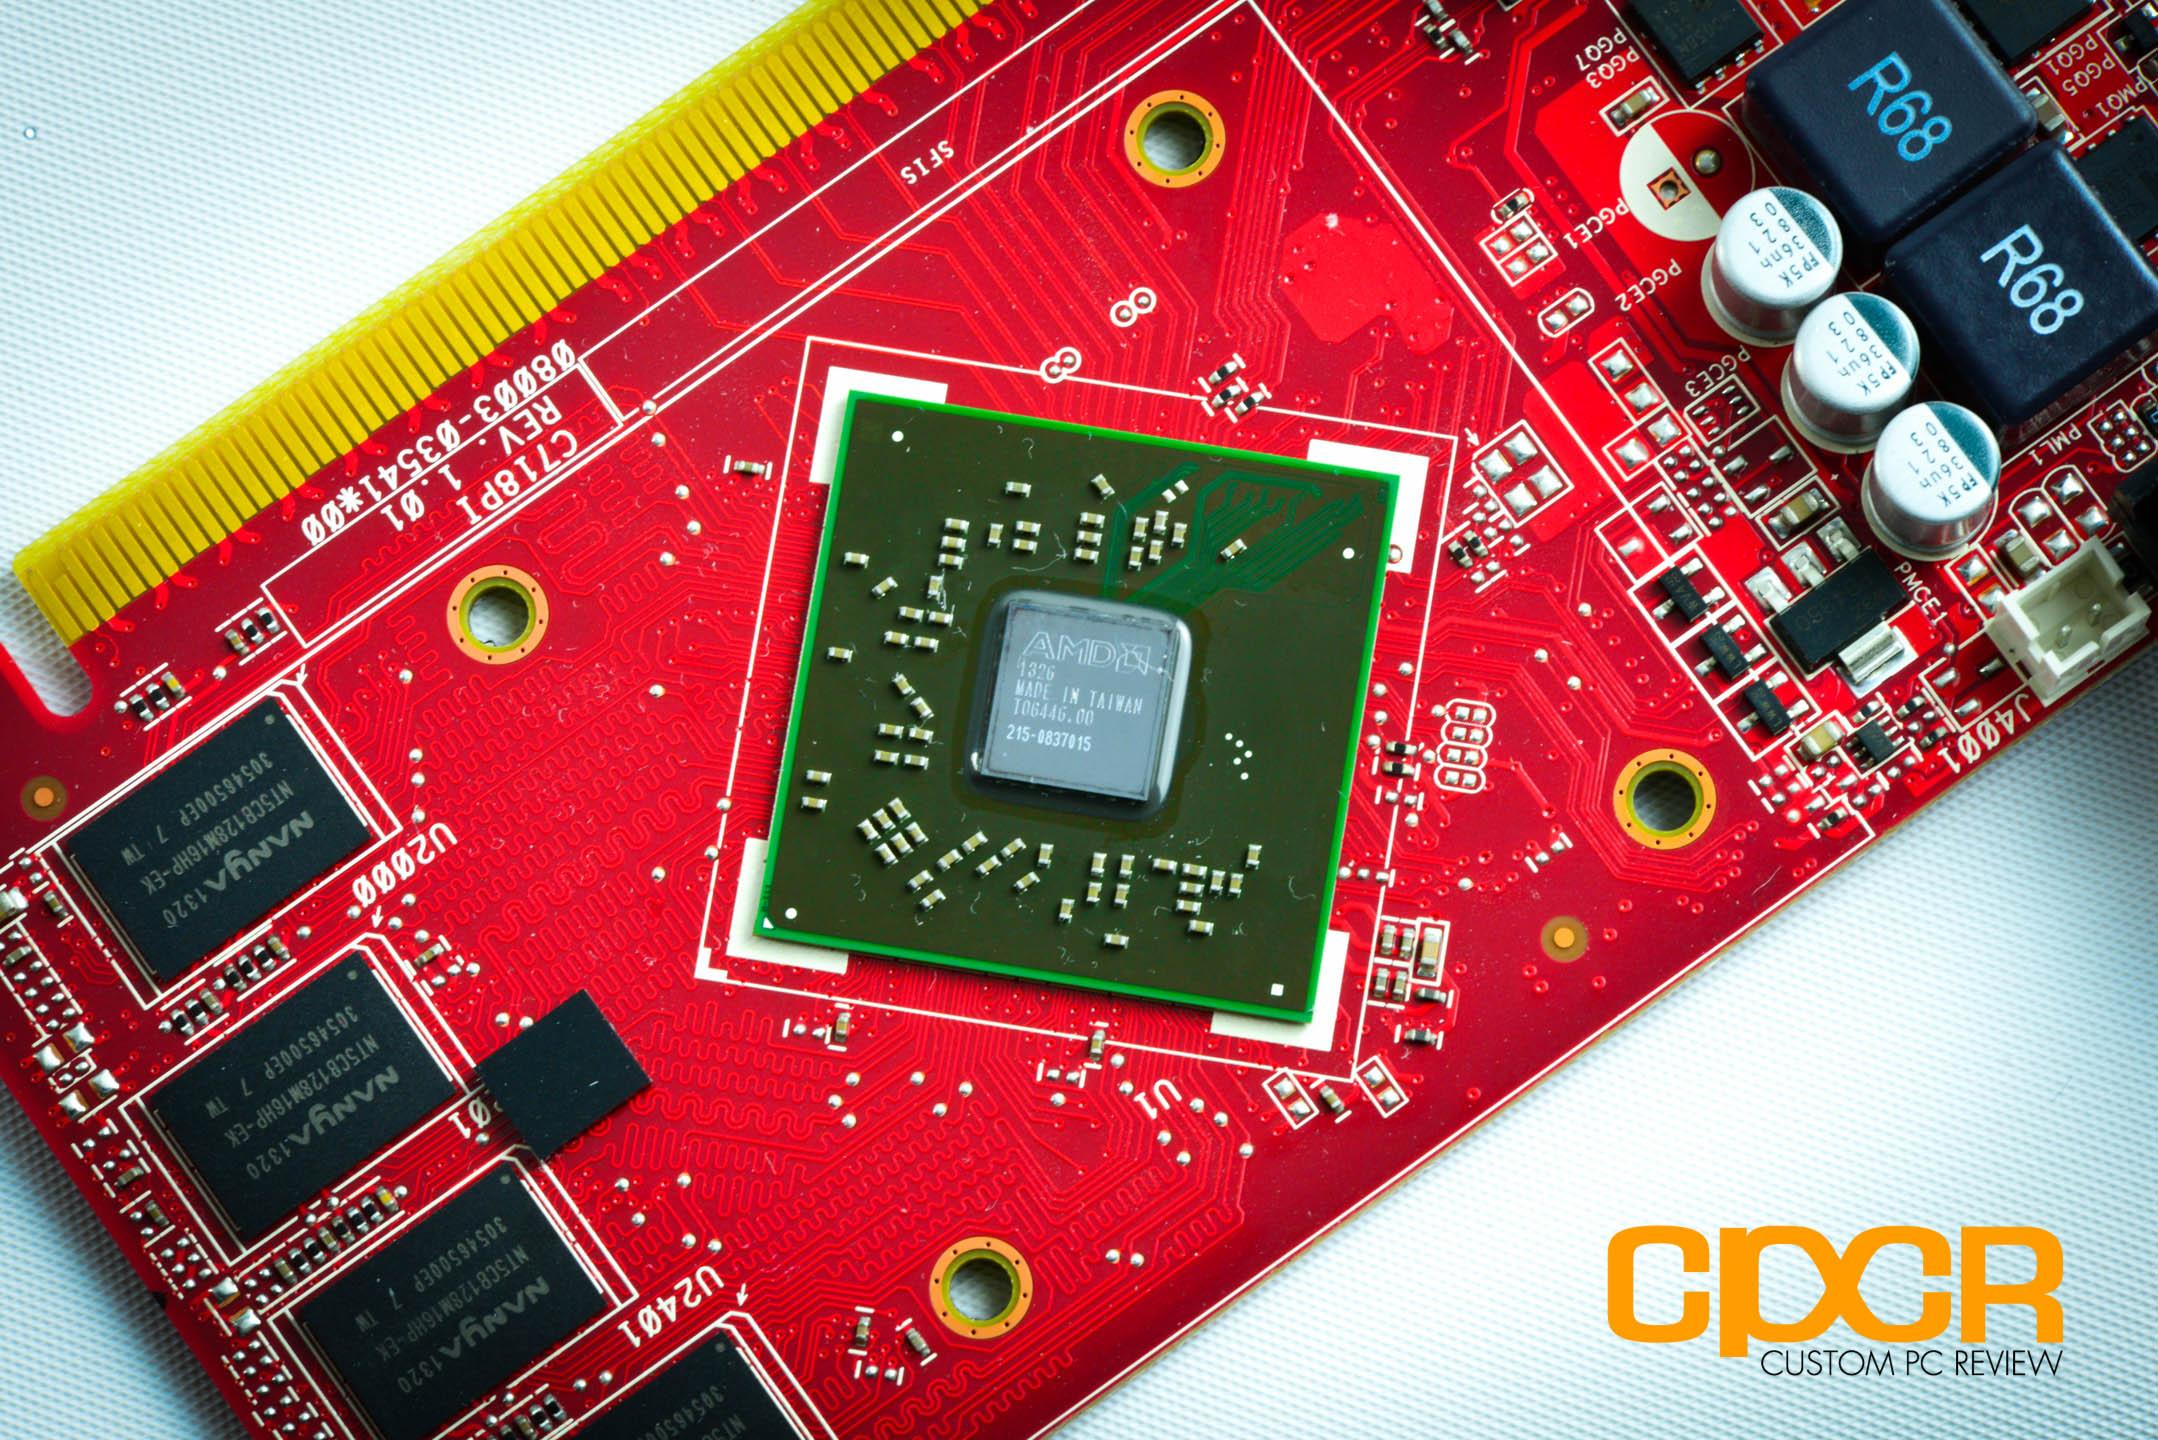 Asus Radeon R7 240 250 Review Graphics Card Custom Pc Vga His R7240 Ram 2 Gb Ddr5 128bit